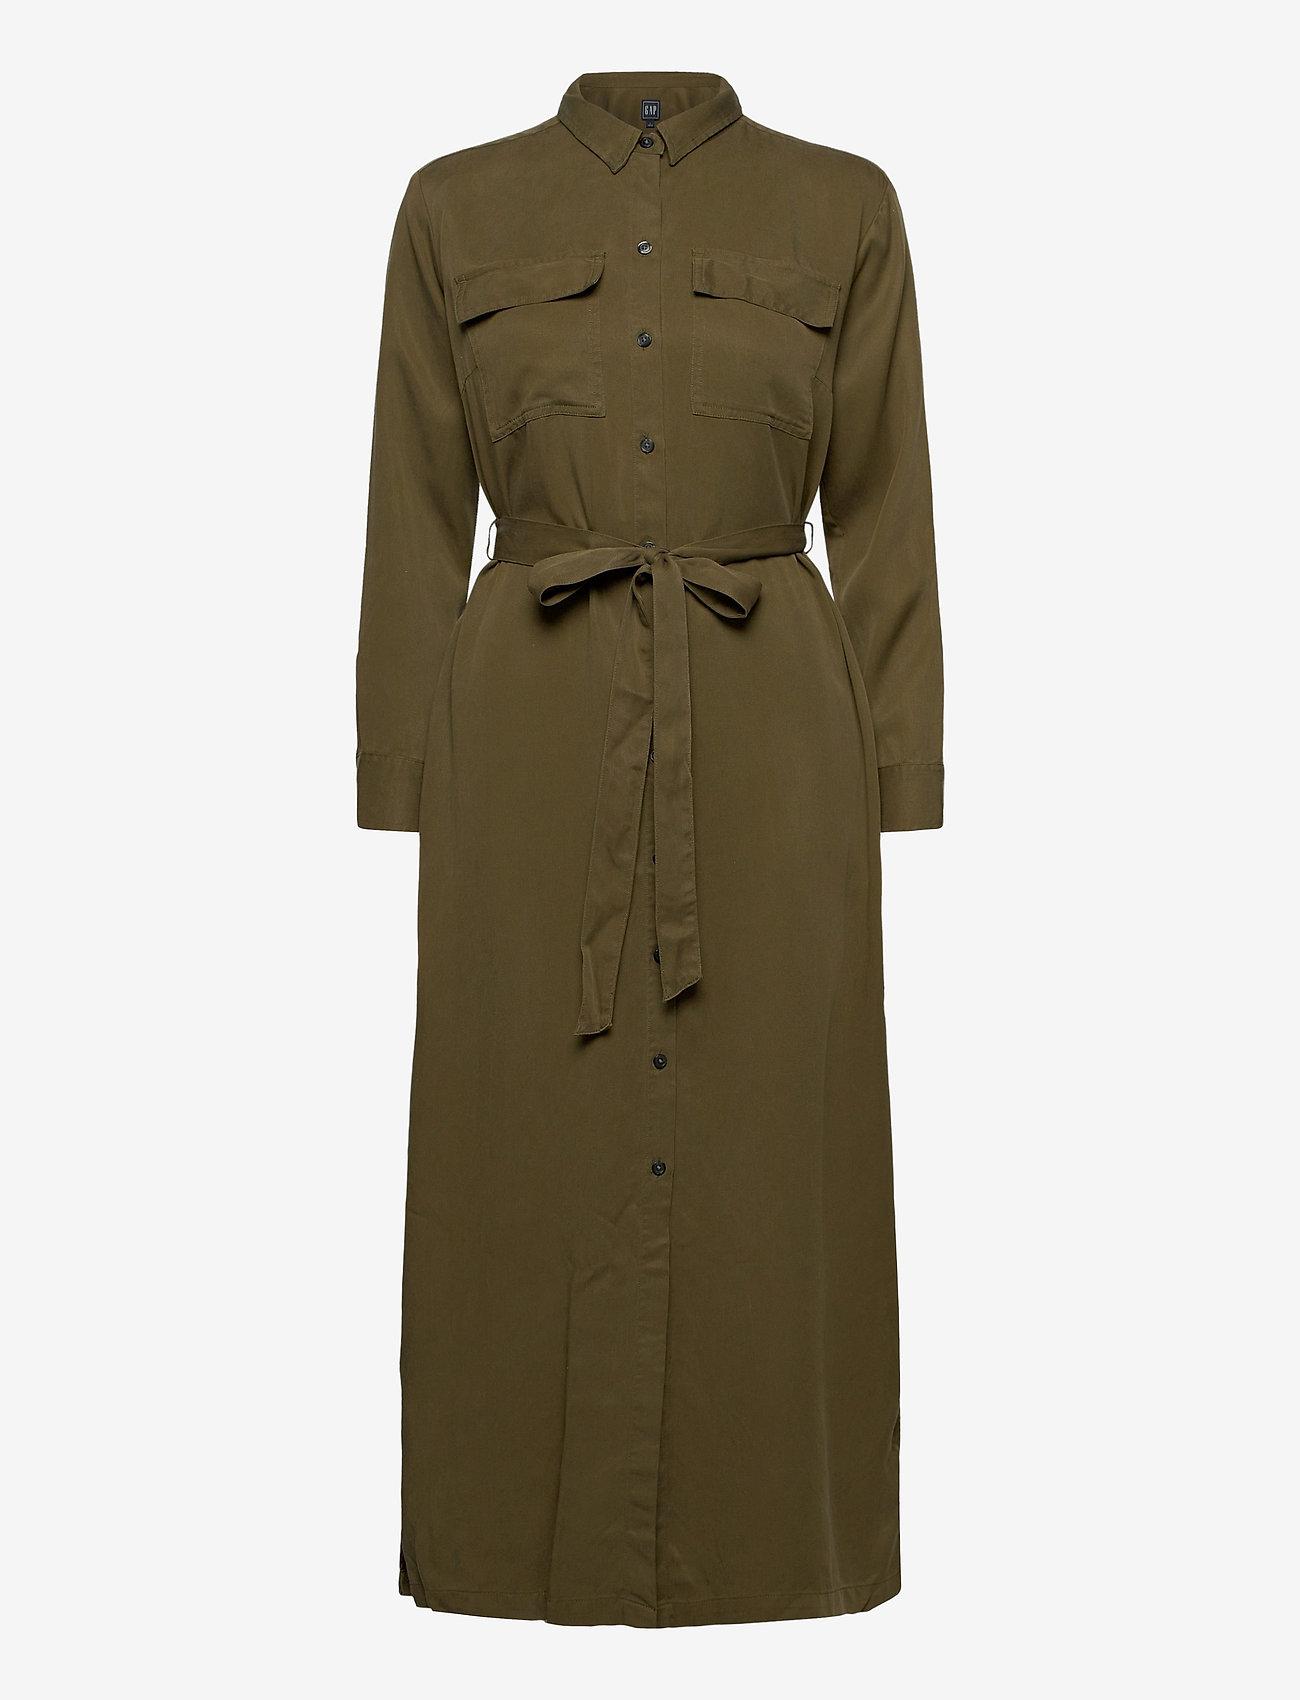 GAP - LS DRAPEY SHRTDRS - midi dresses - ripe olive - 0